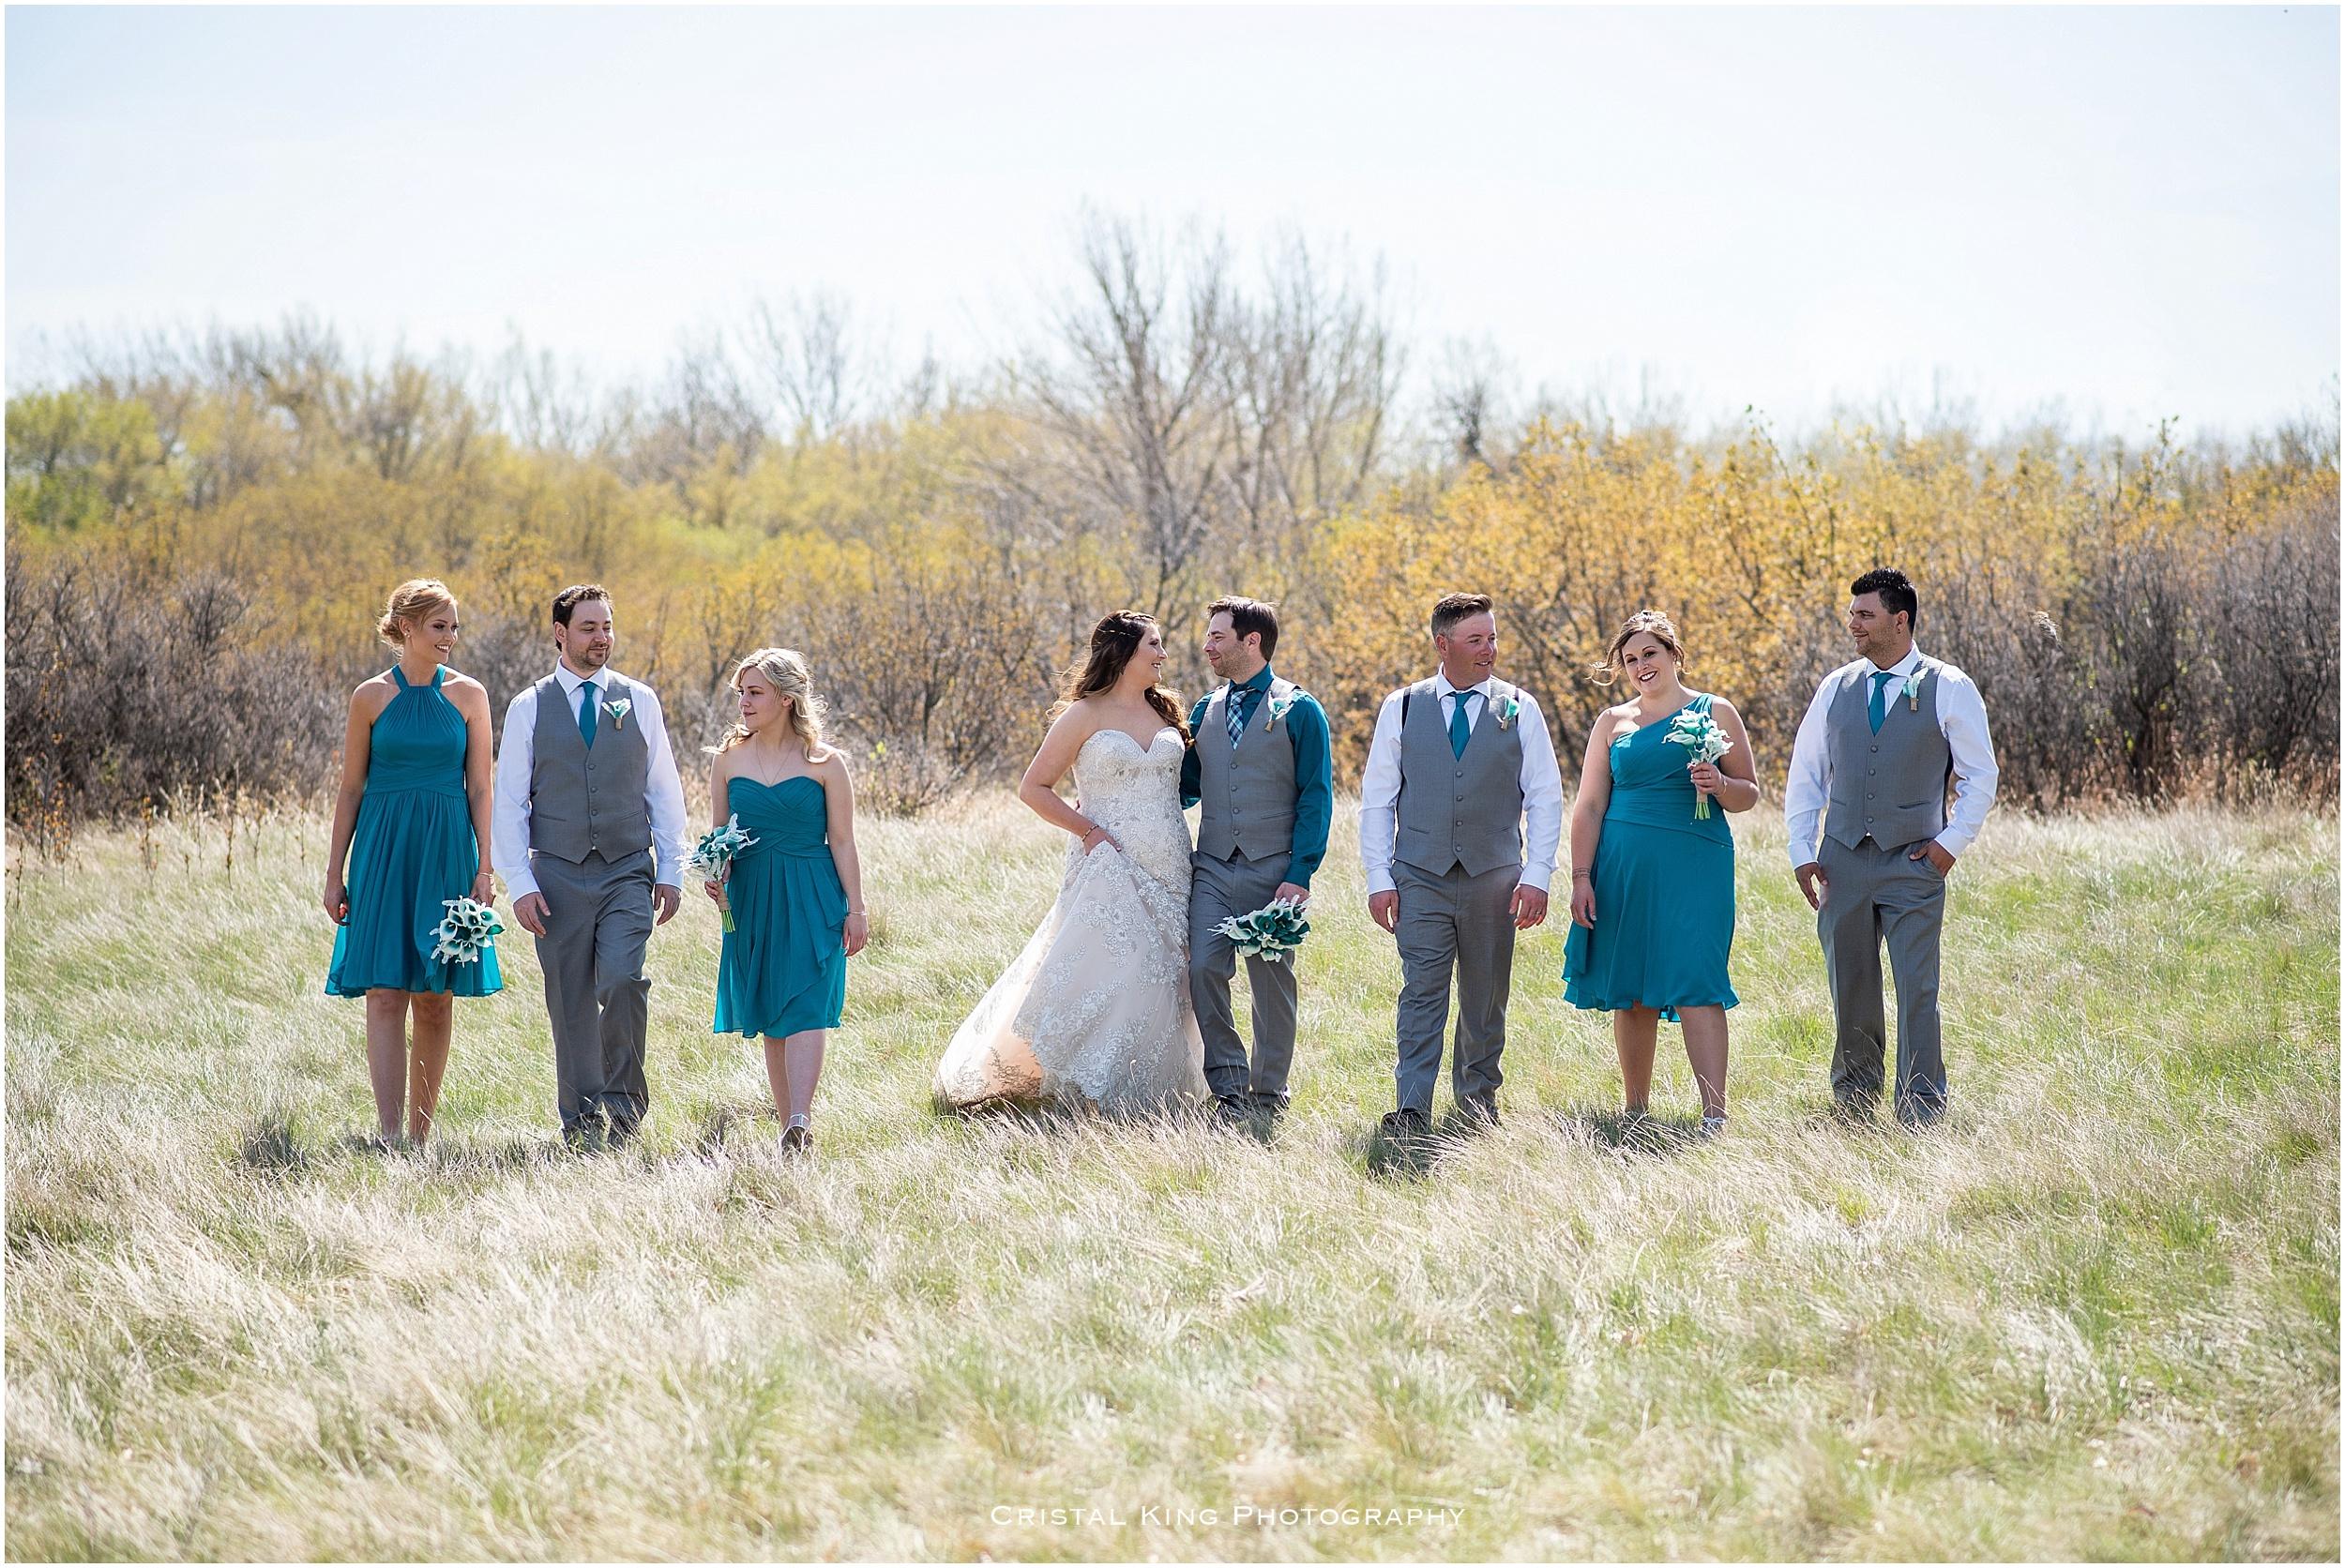 Myla & Grant Wedding-76.jpg